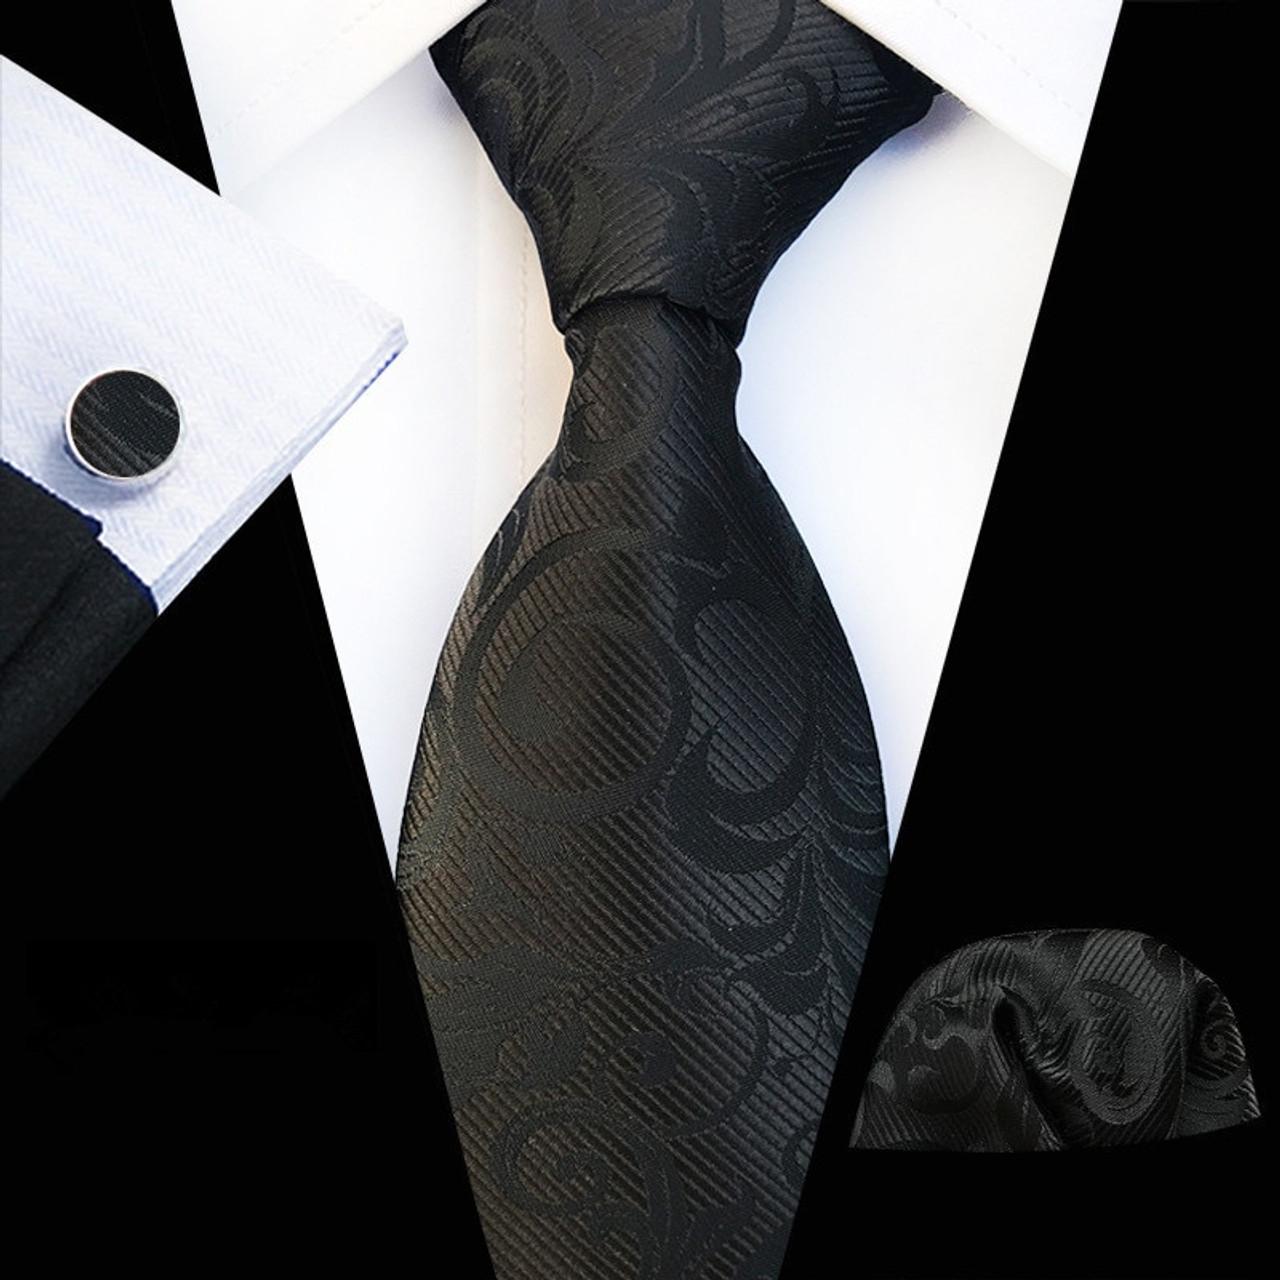 08065f562b85 ... Fashion New Design Tie Set Business Men's Silk Floral Print Ties Mens  Tie Set Dark Green